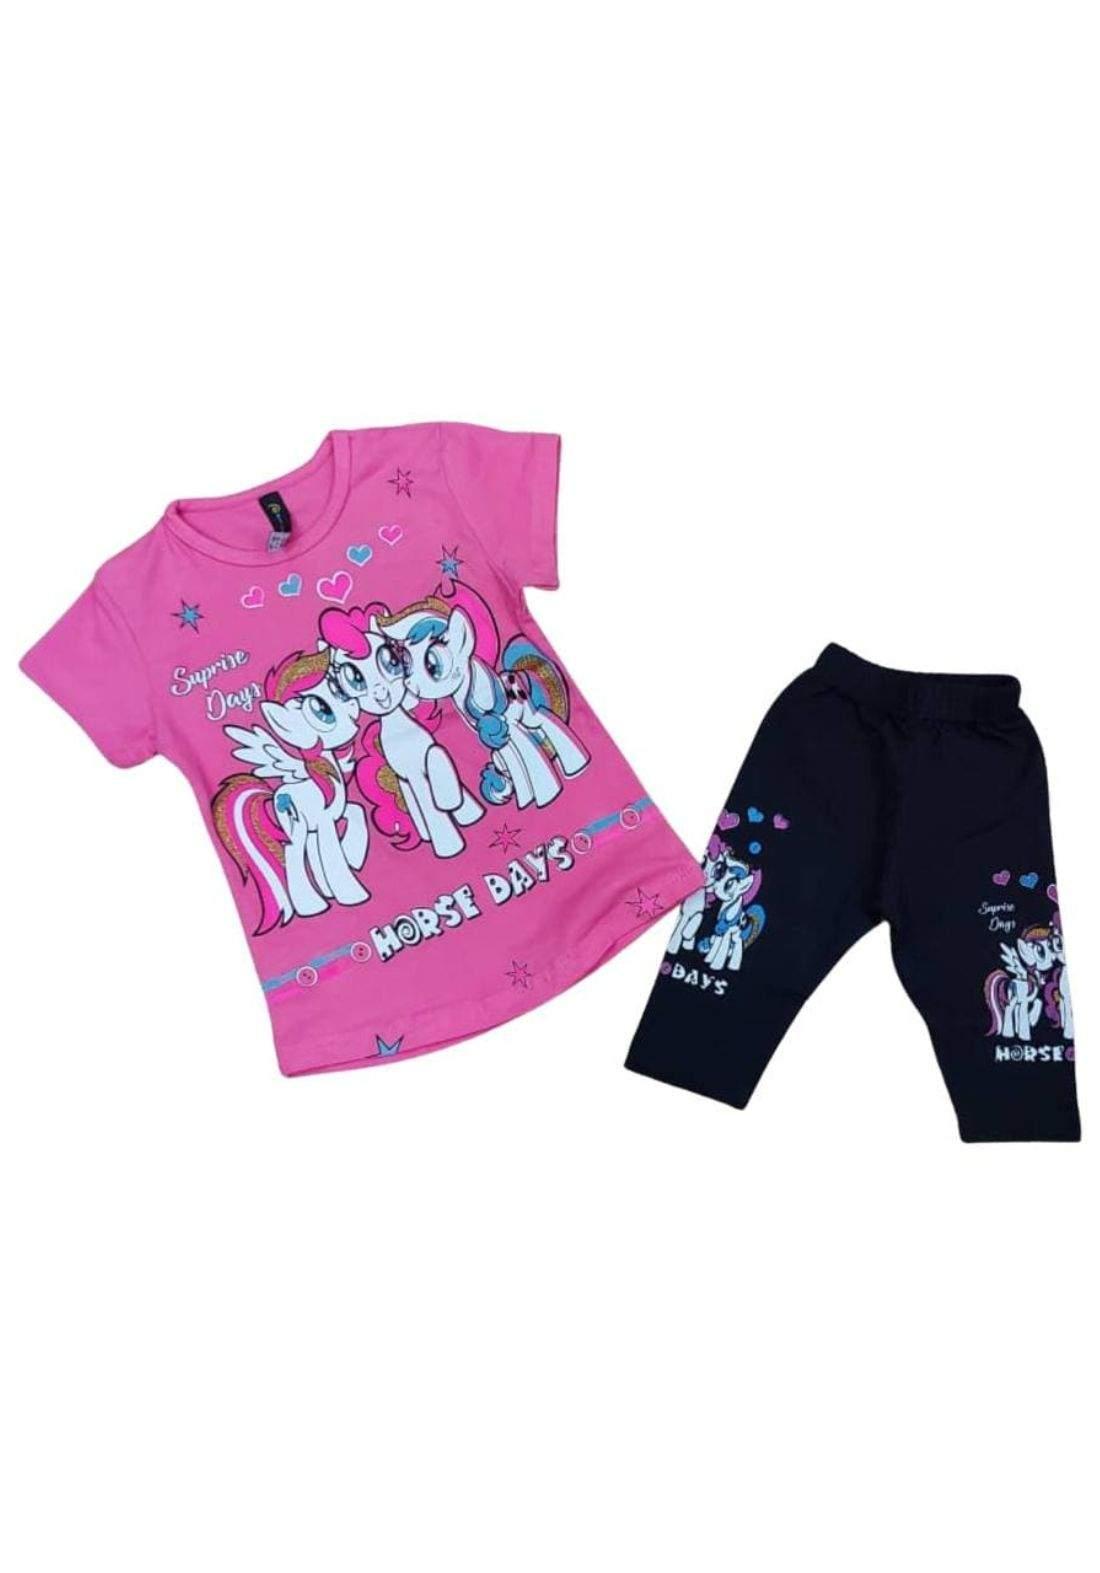 Tracksuit for girls Pink (T-shirt +short) ( تراكسوت  وردي (برموده وتيشيرت